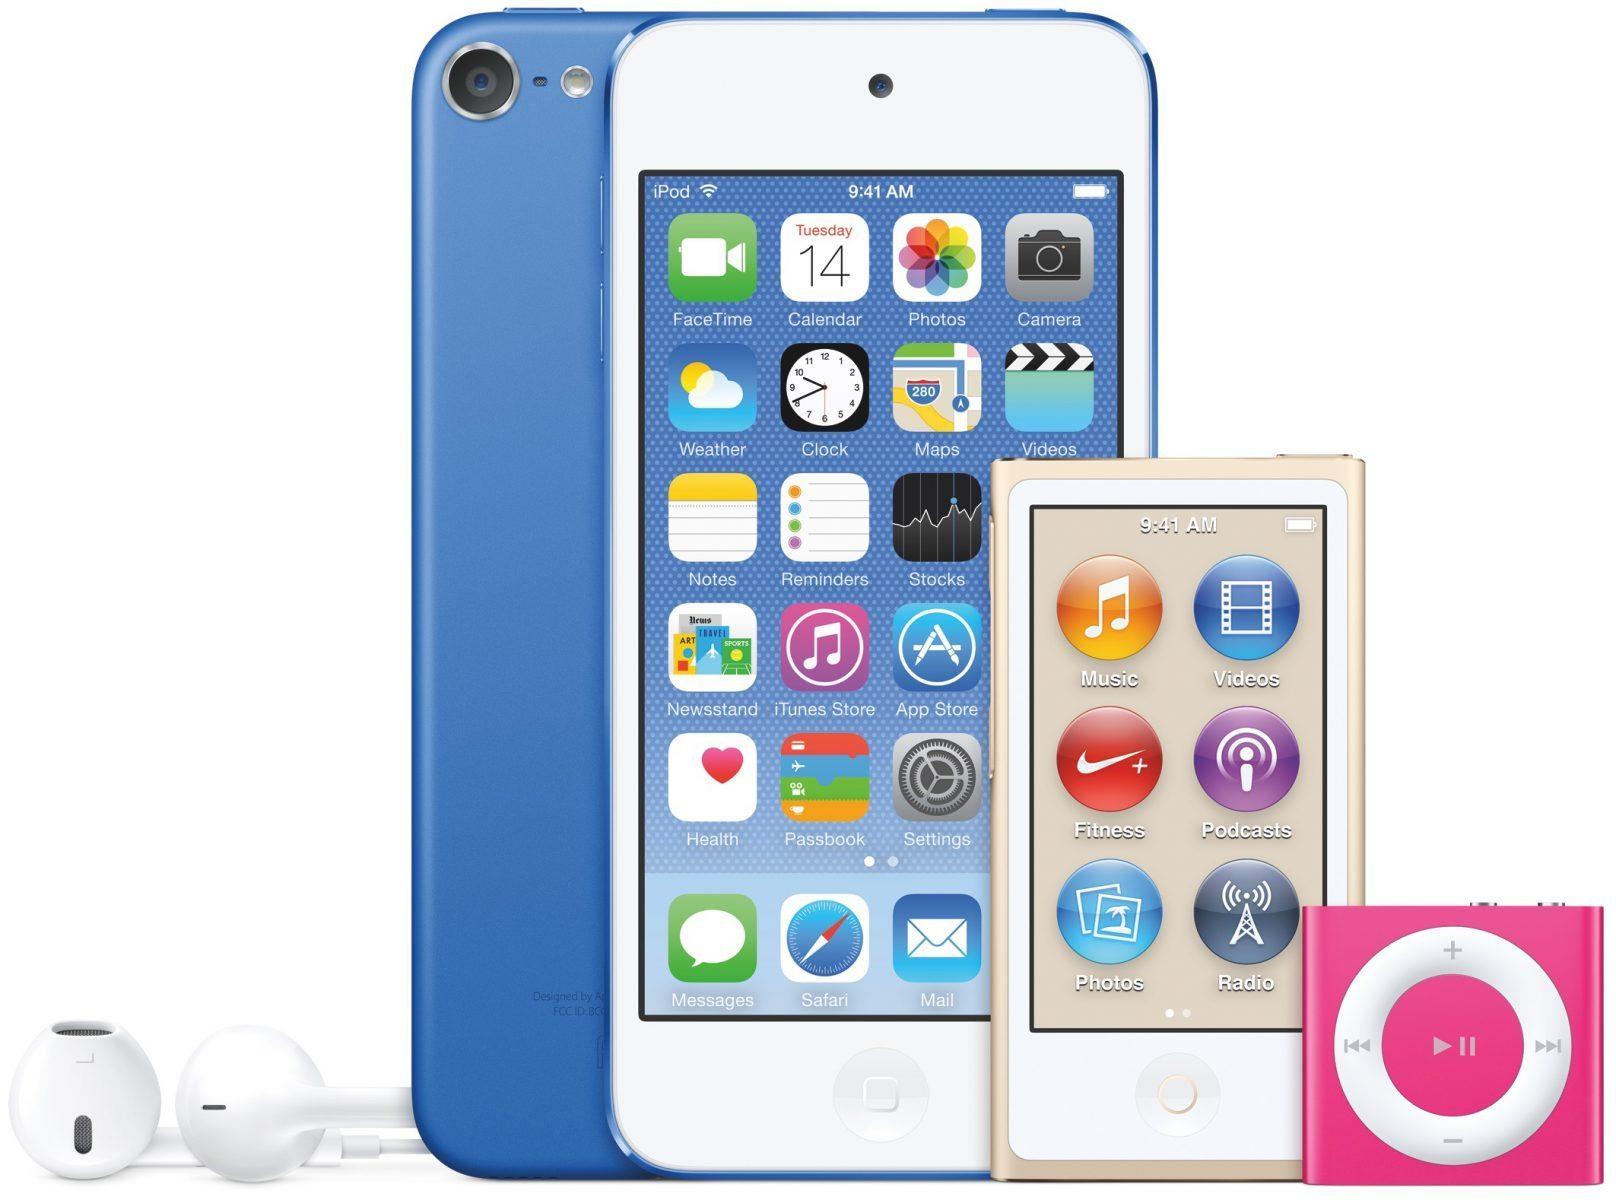 iPod-family-mid-2015-image-001